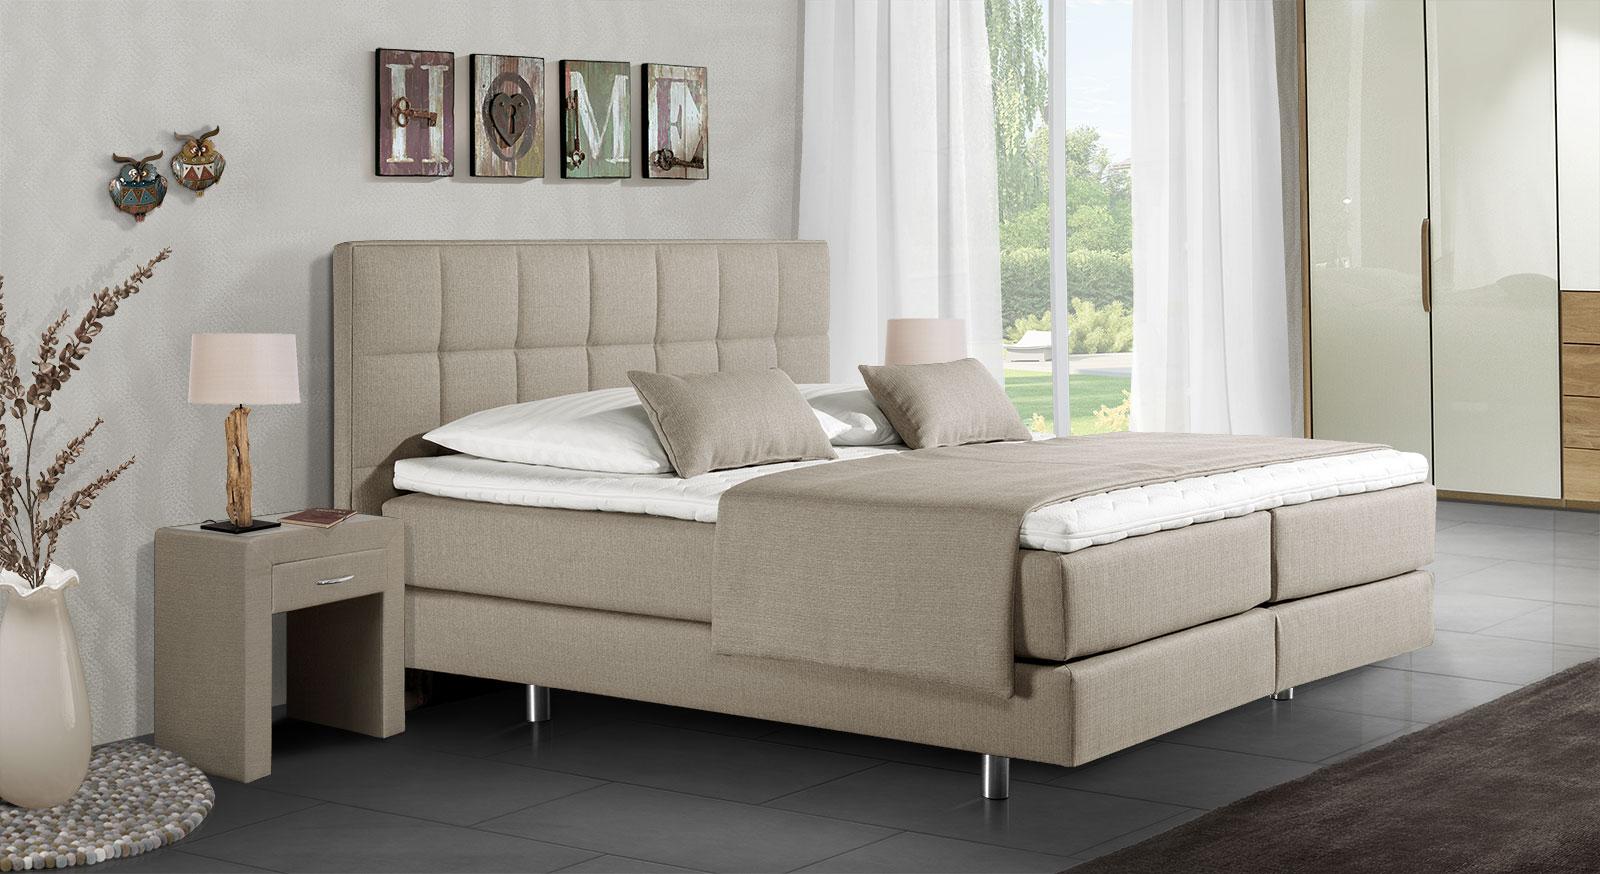 boxspringbett design. Black Bedroom Furniture Sets. Home Design Ideas